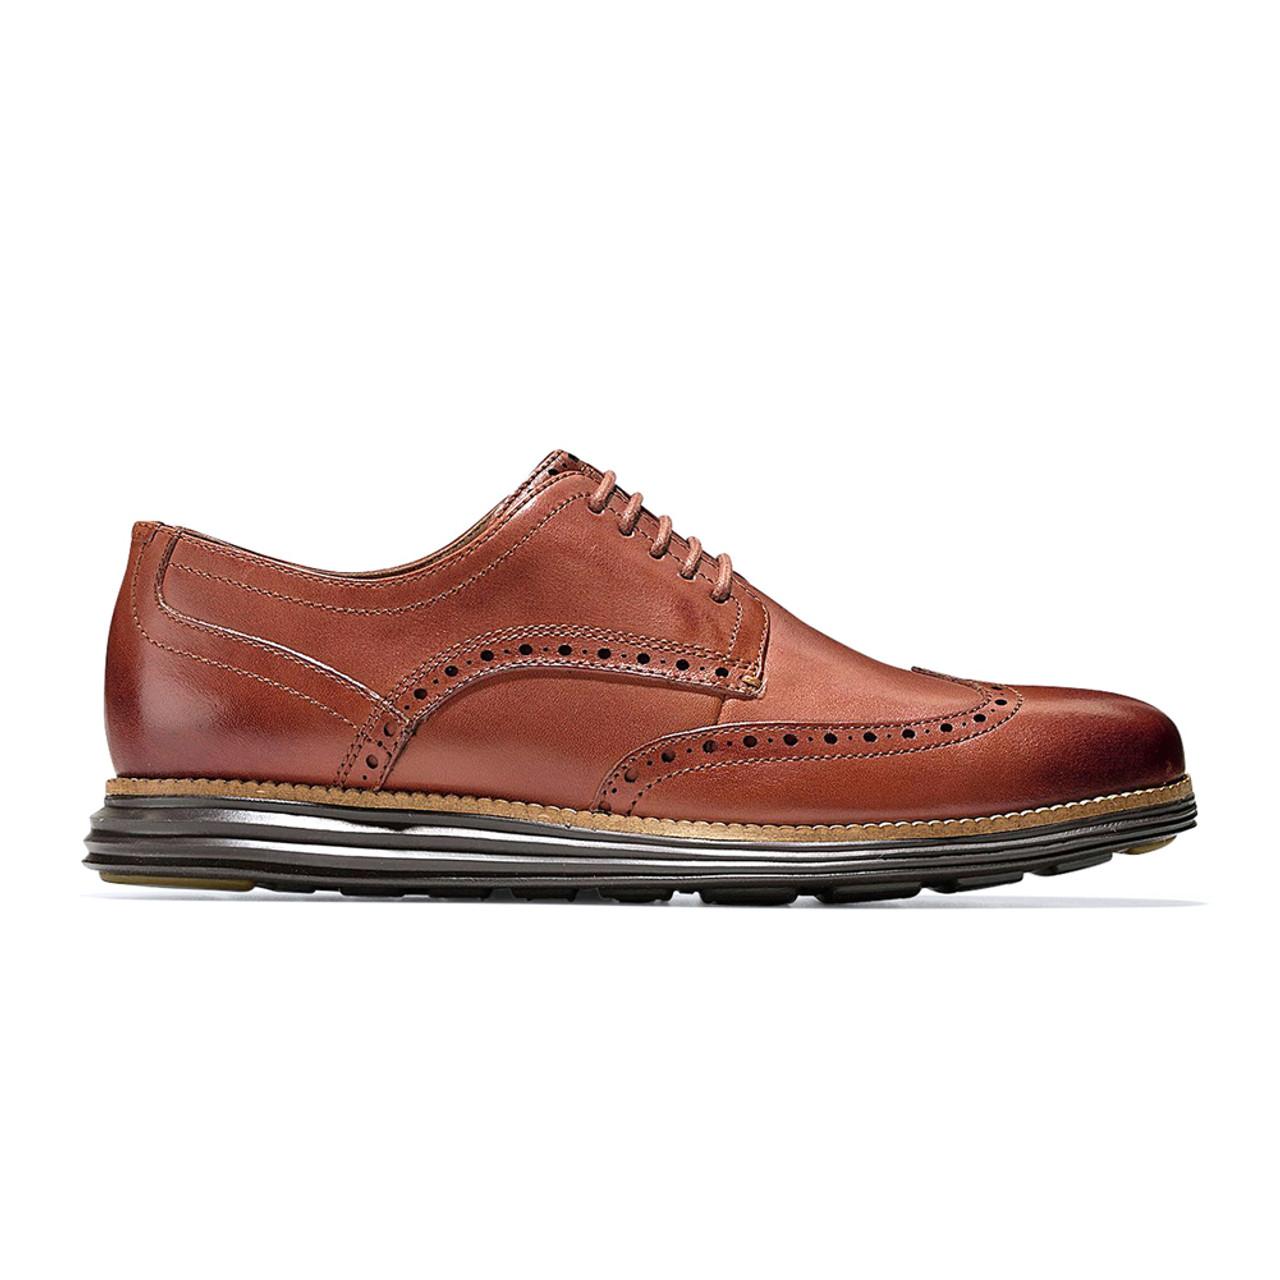 Discount Cole Haan Mens Shoes \u0026 More